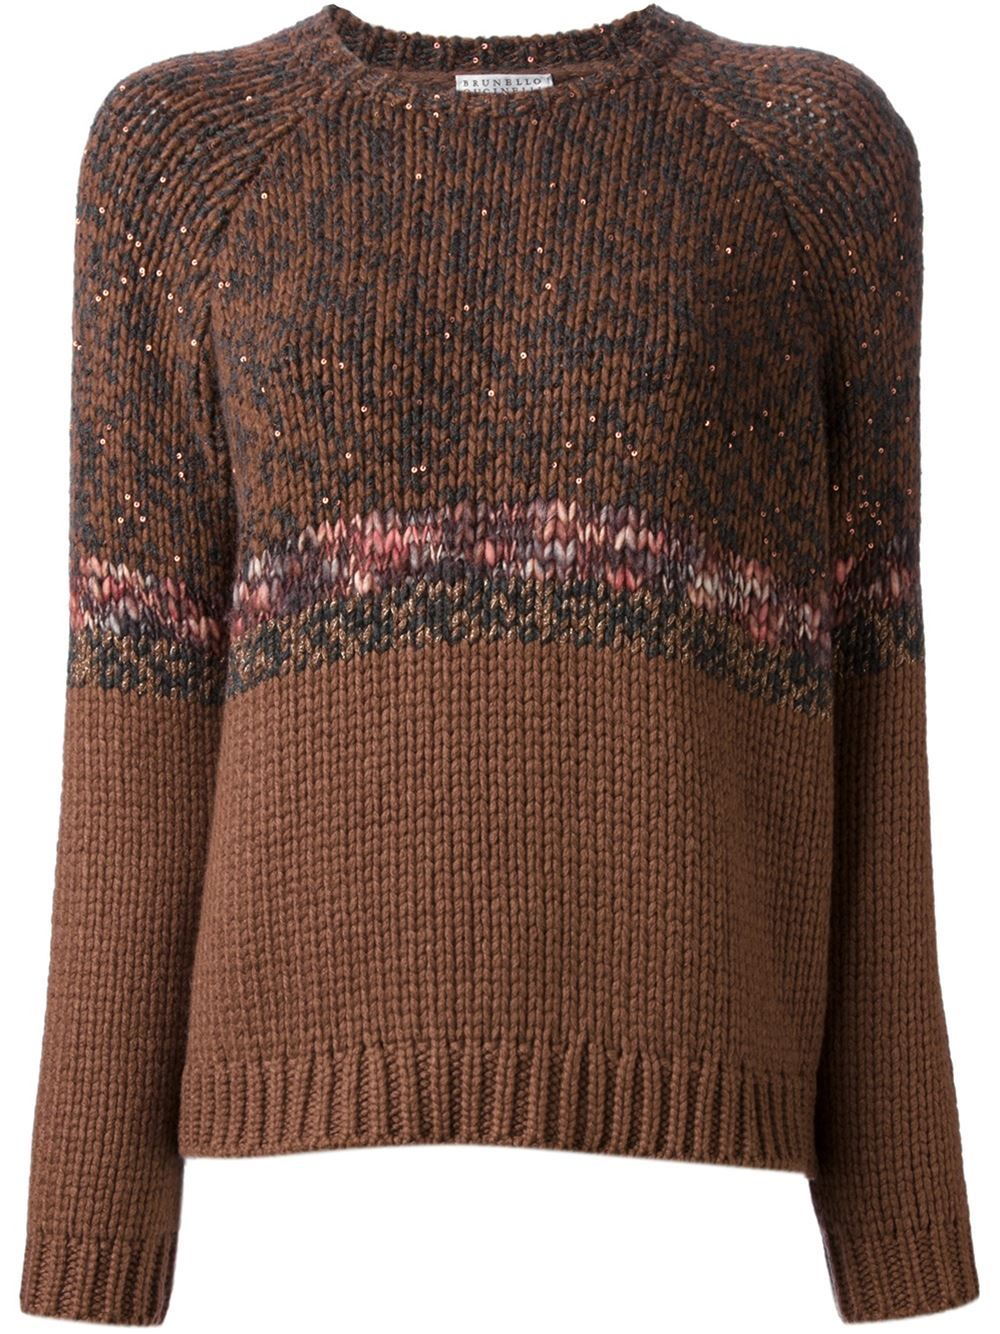 Brunello Cucinelli Knit Sweater Stefania Mode Farfetch